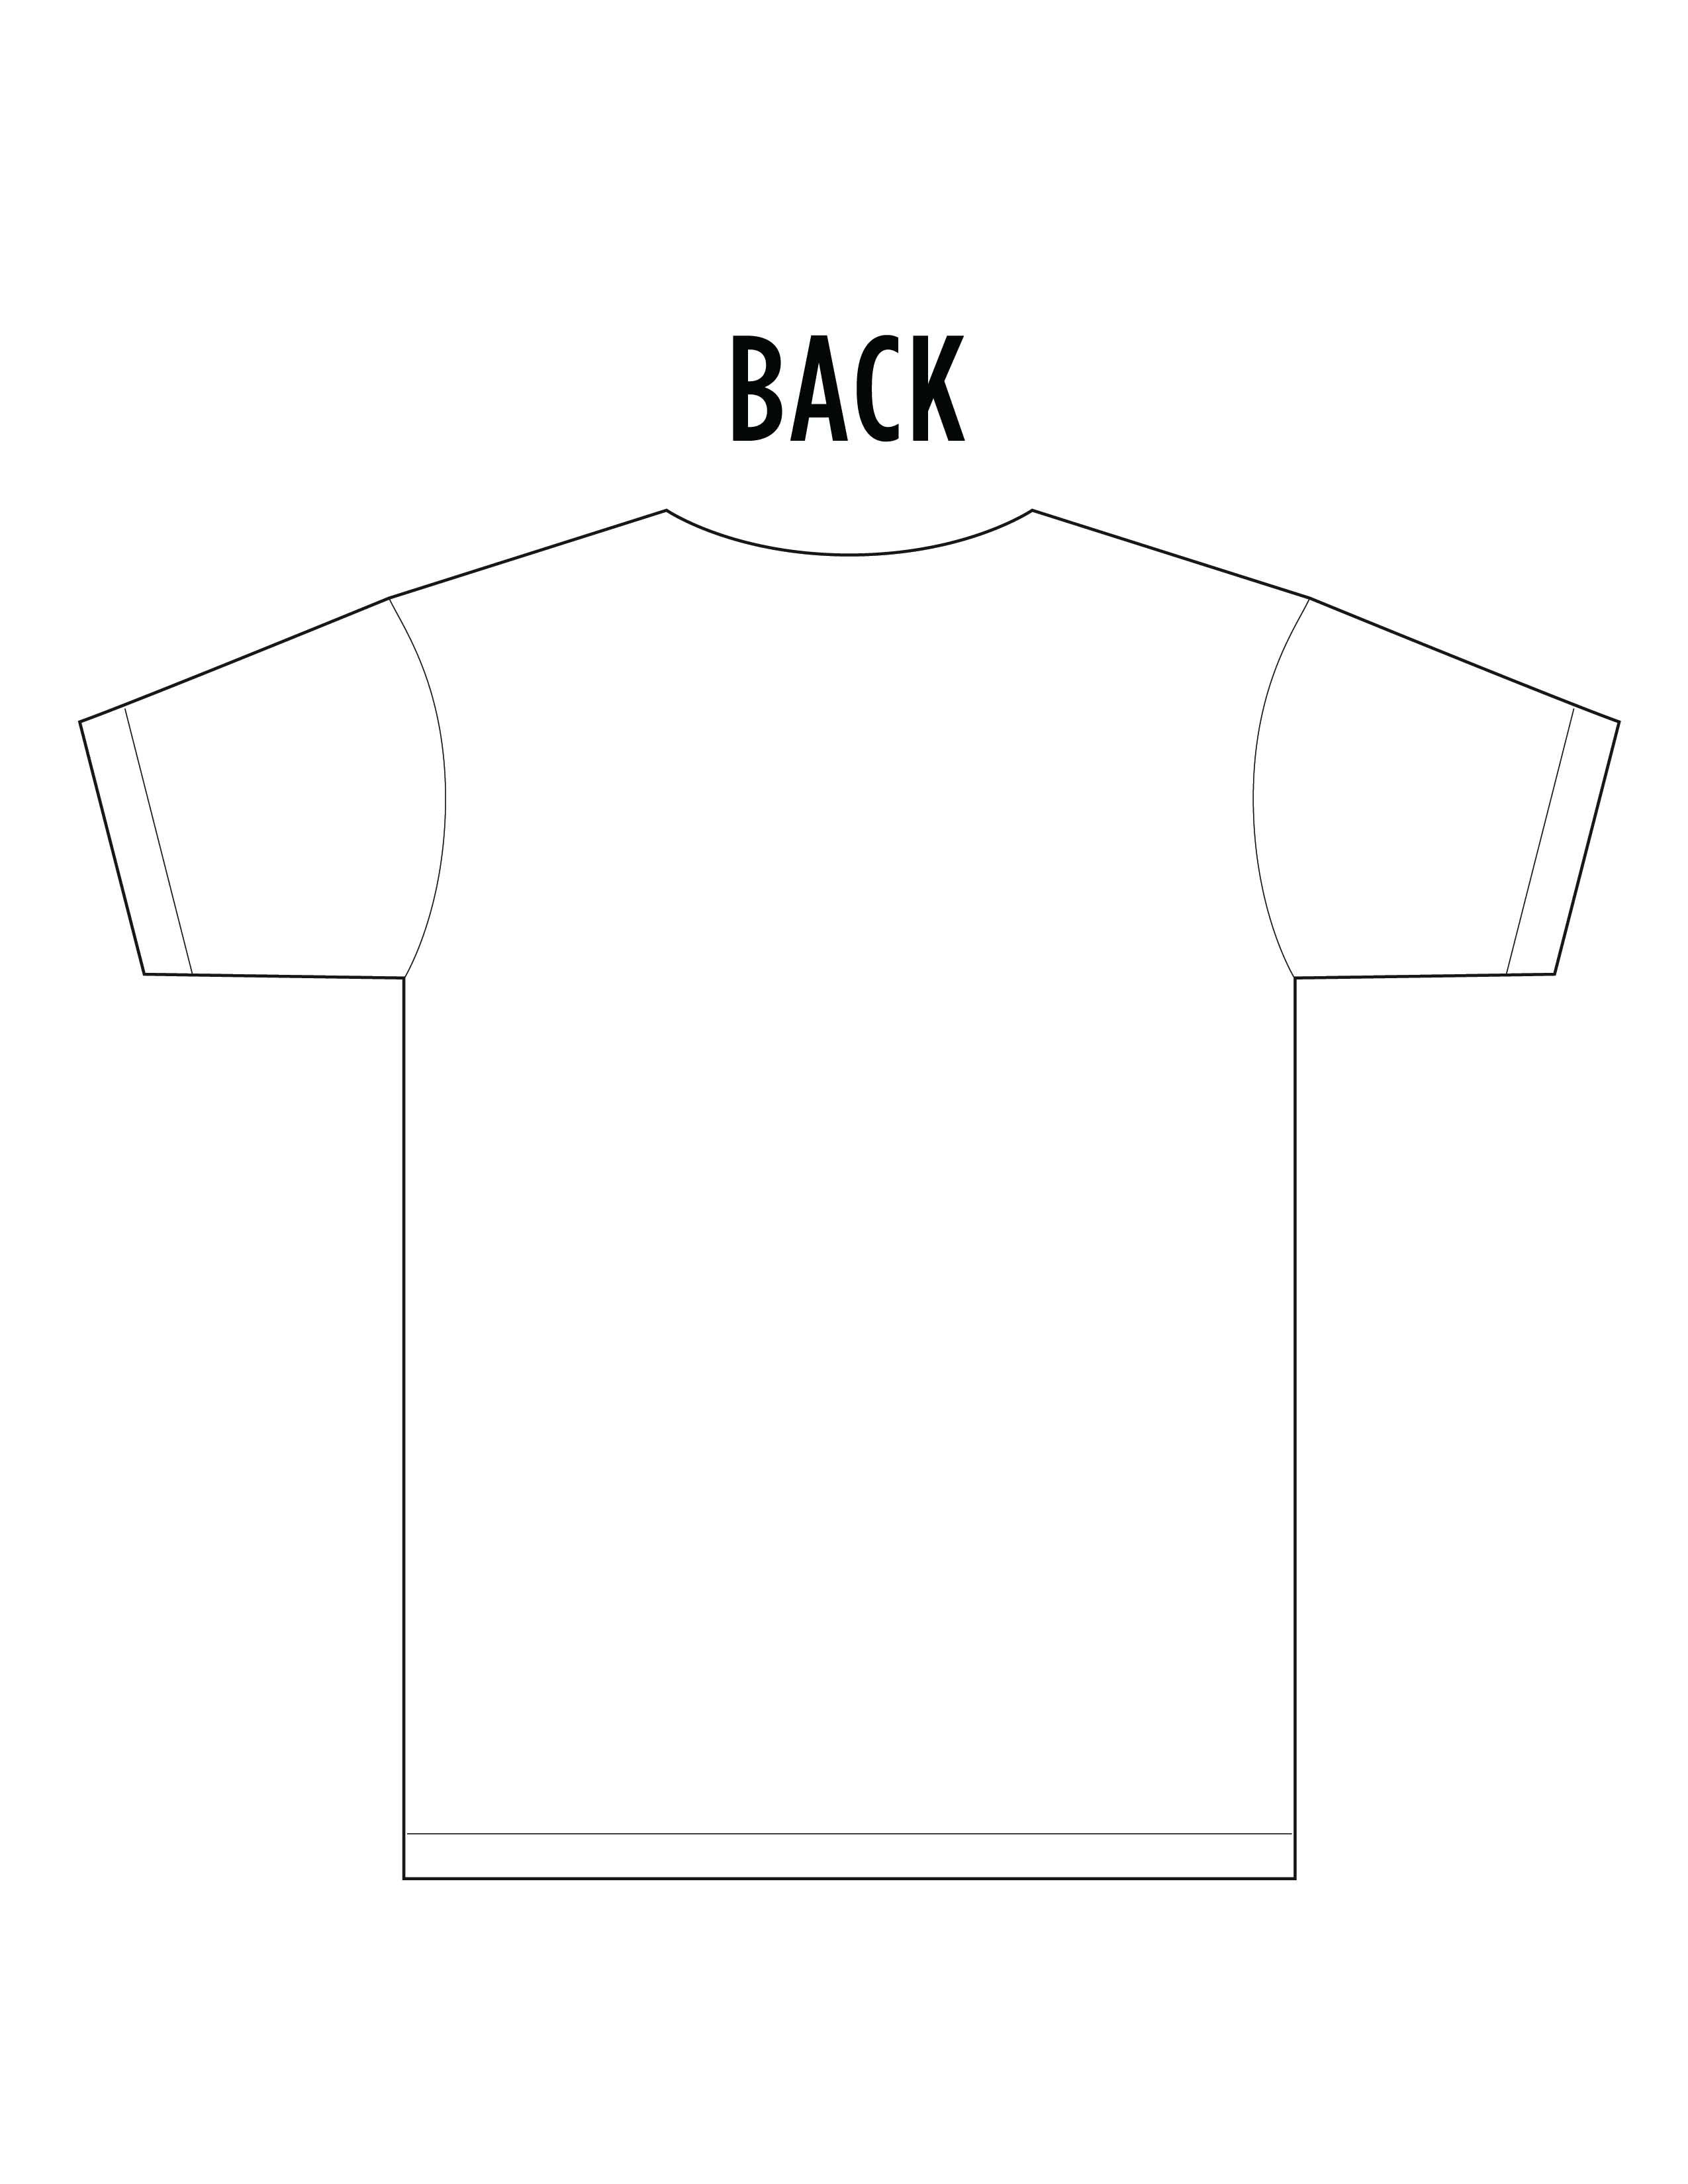 T Shirt Back Design Clipart Best